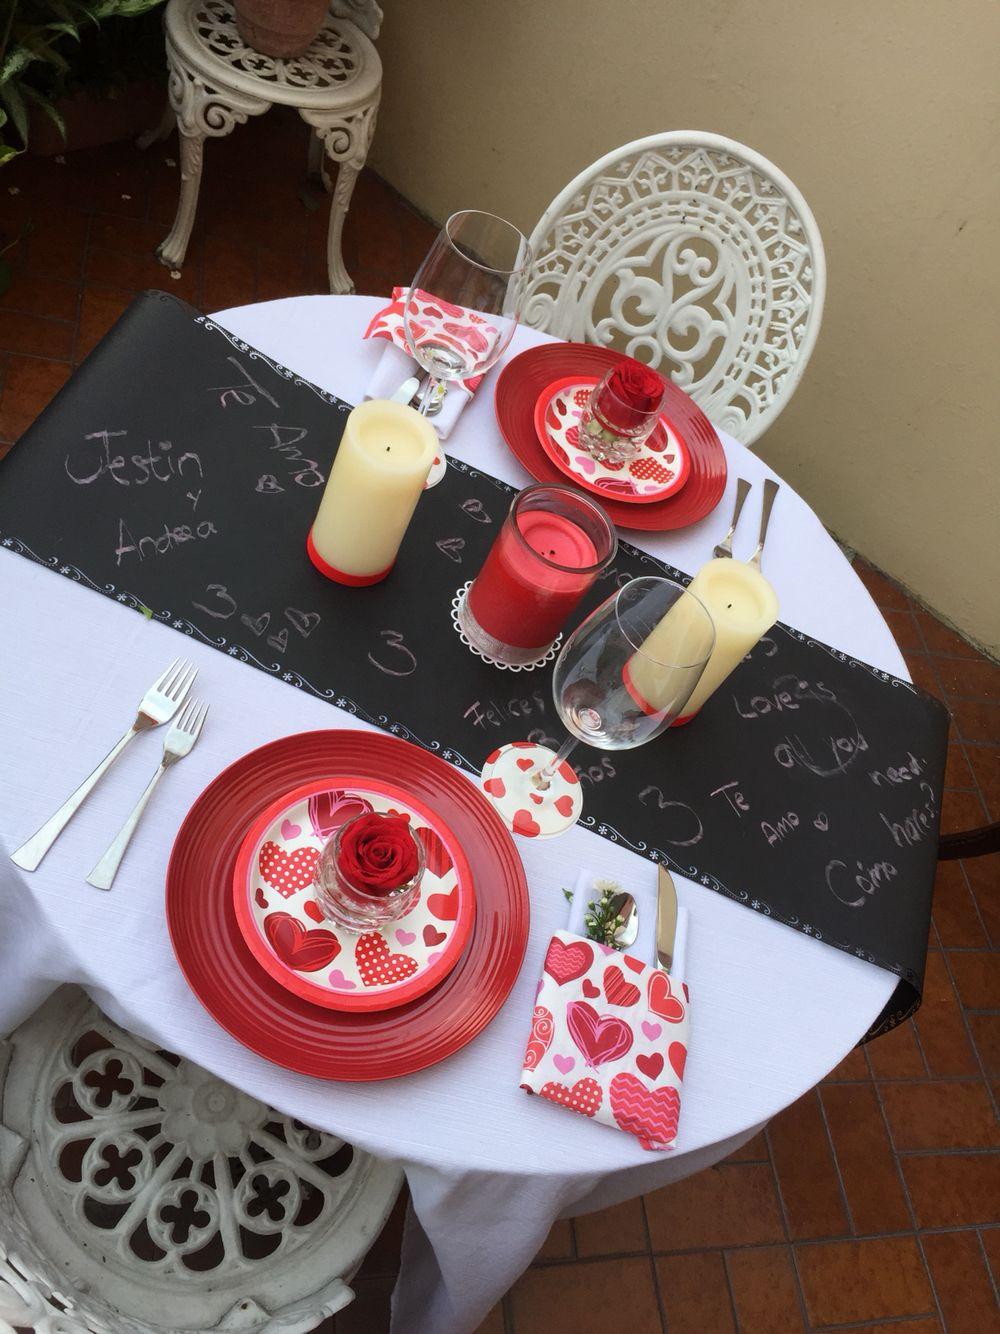 Decoracion De Mesa Para Cena Romantica Romantic Dinner Pinterest - Cena-romantica-decoracion